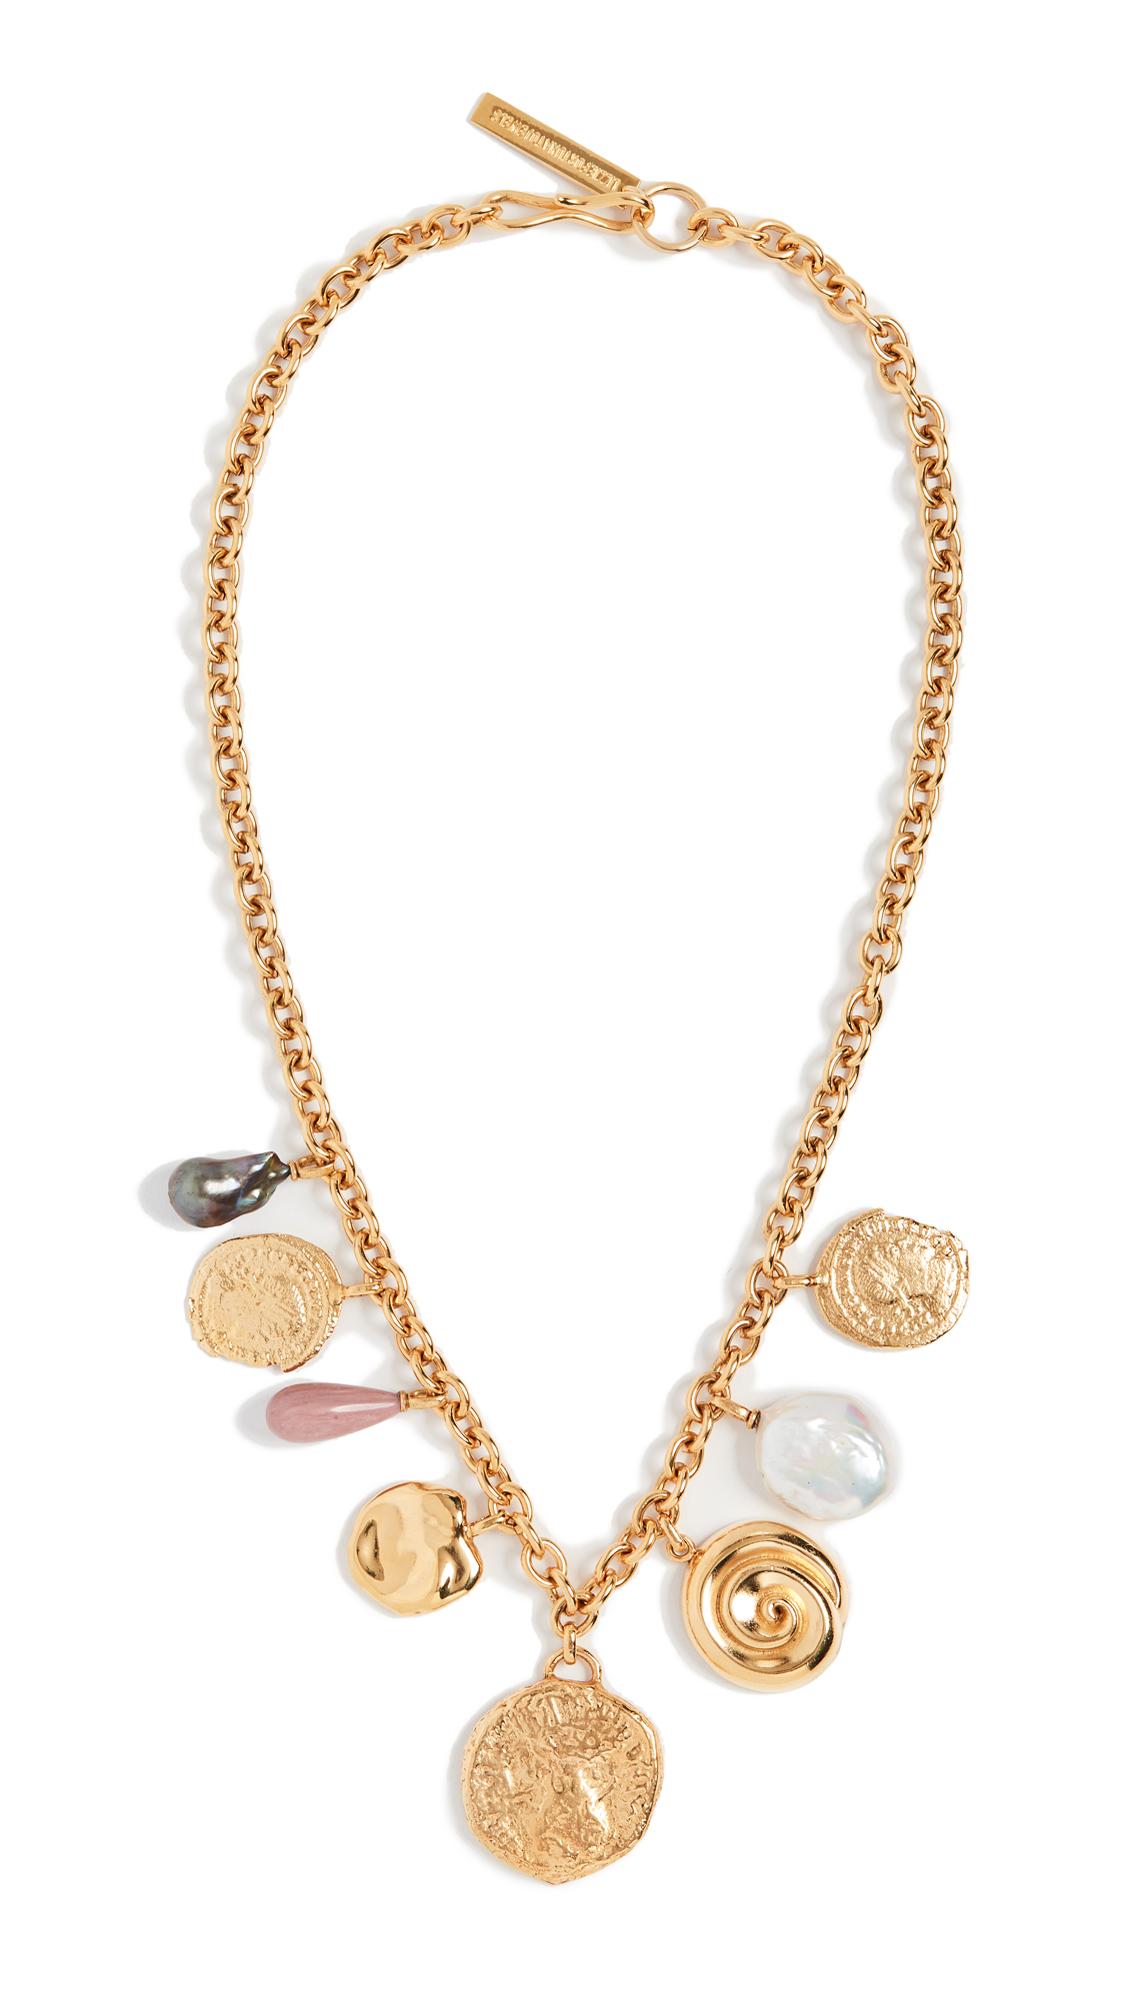 Lizzie Fortunato Victoria Charm Necklace In Gold